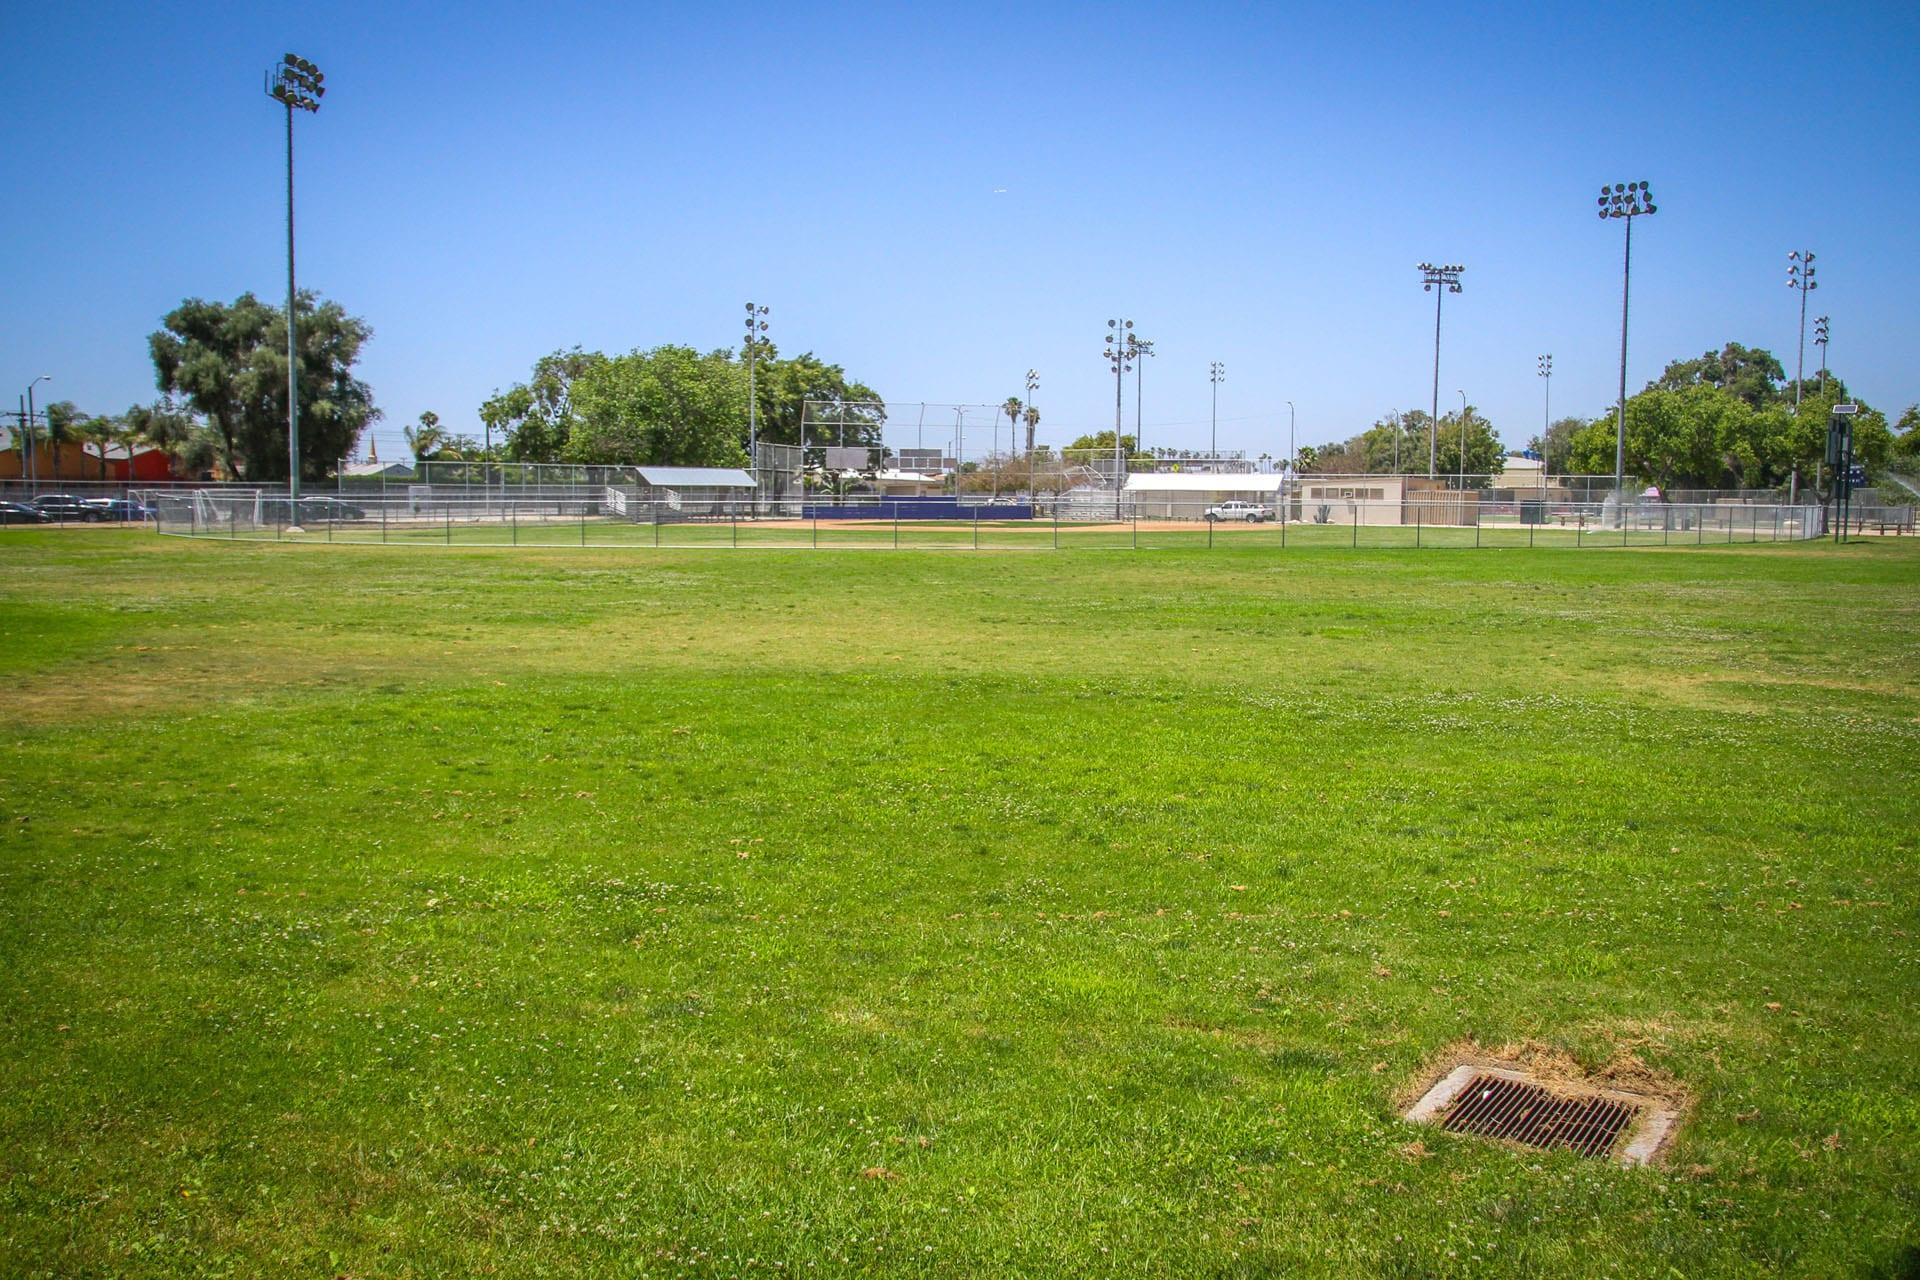 Grass area outside of baseball field